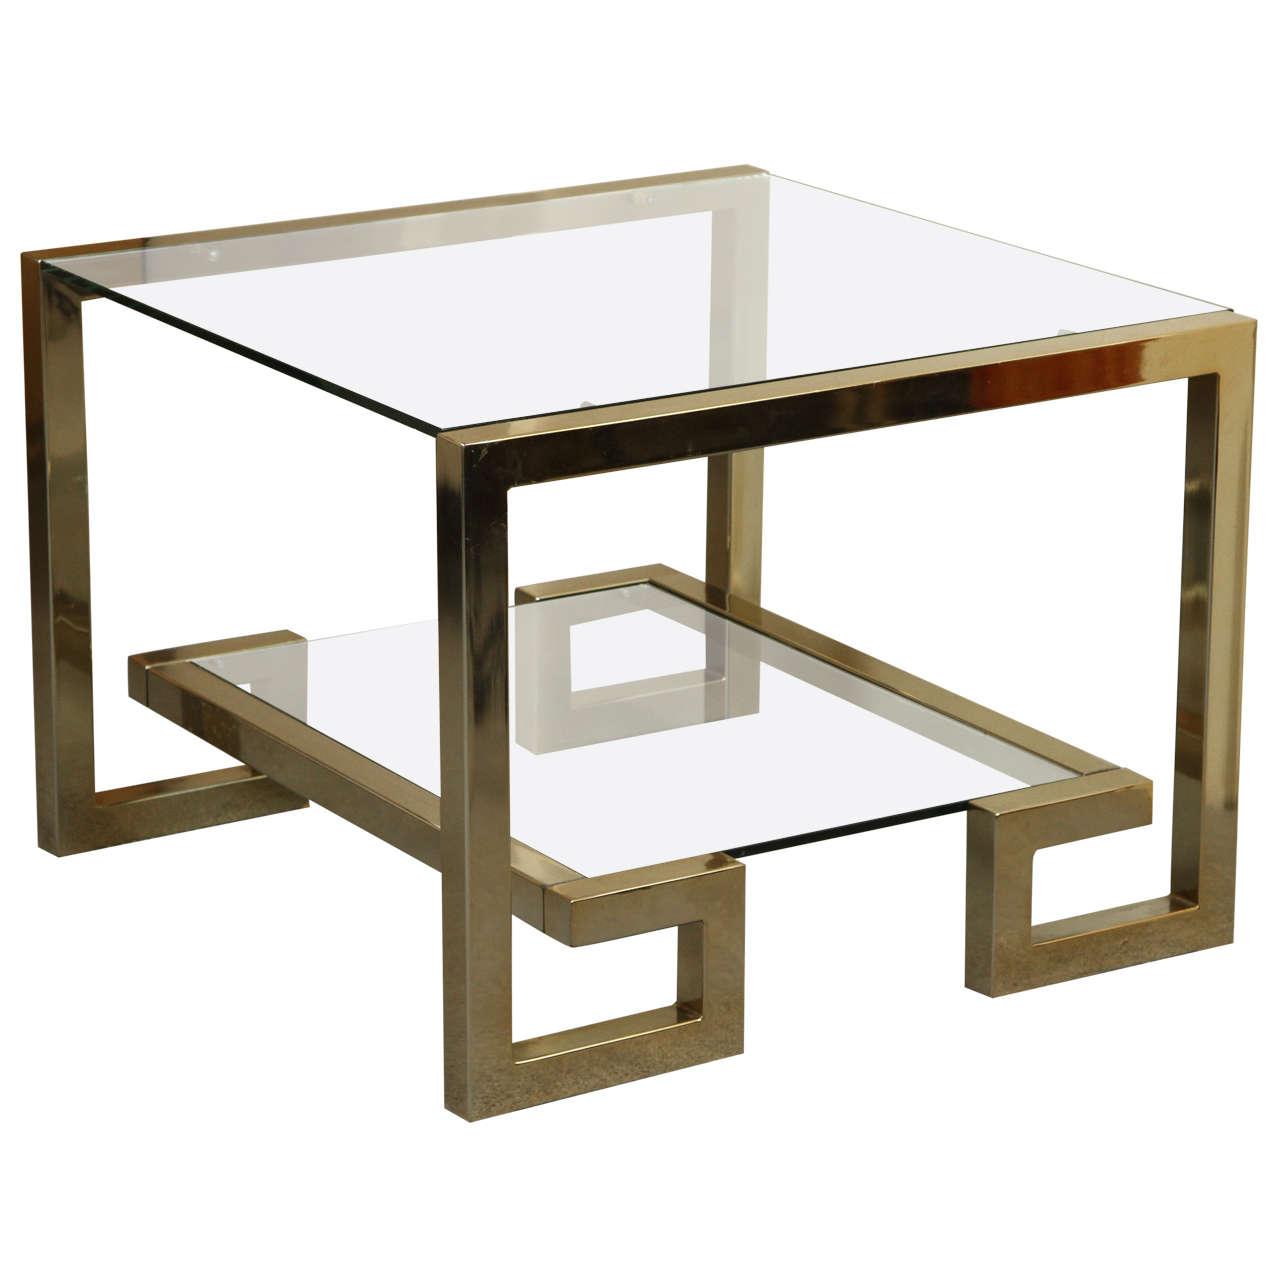 Stylish greek key brass and glass coffee table at 1stdibs for Brass and glass coffee table